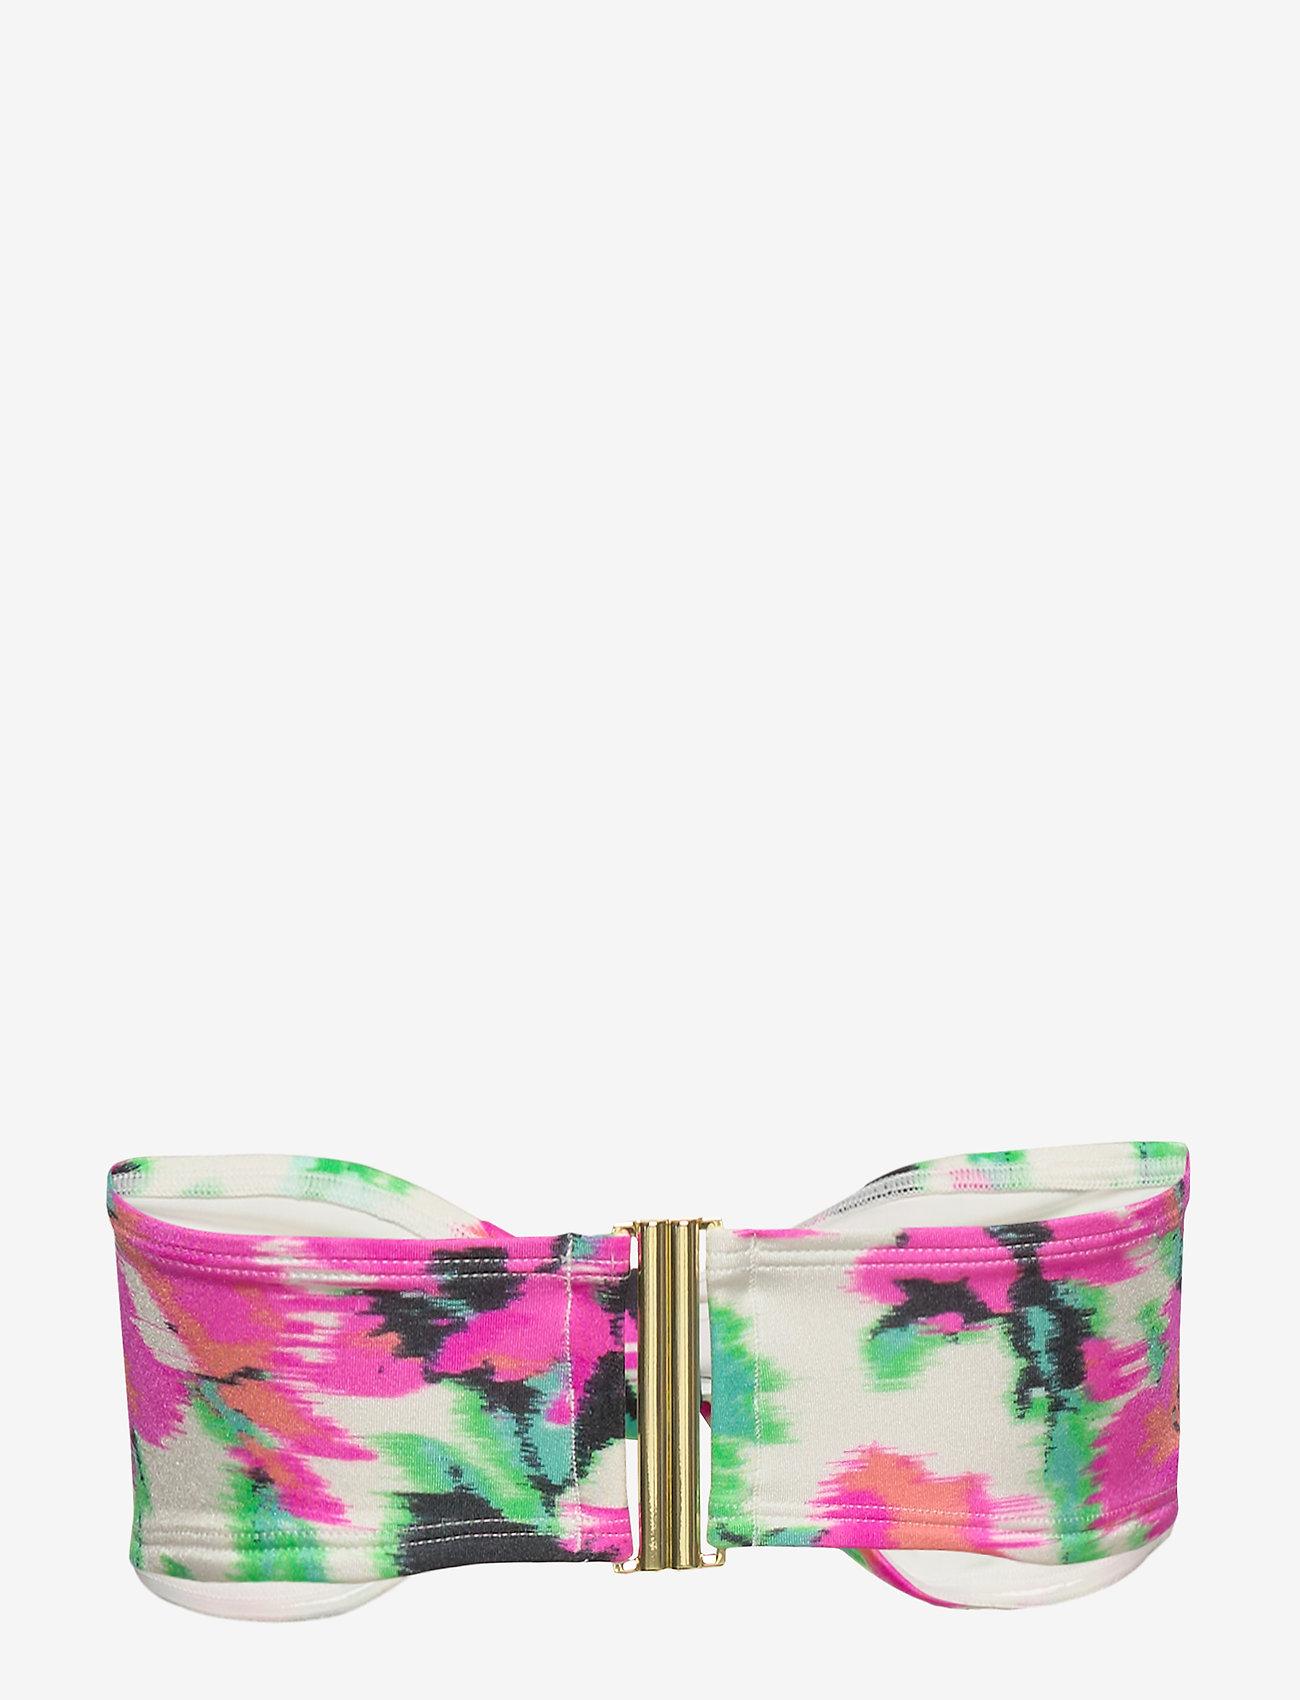 Ivyrevel - SANTORINI BLURRED FLORAL BIKINI TOP - hauts de 2 pièces  - blurred floral - 1